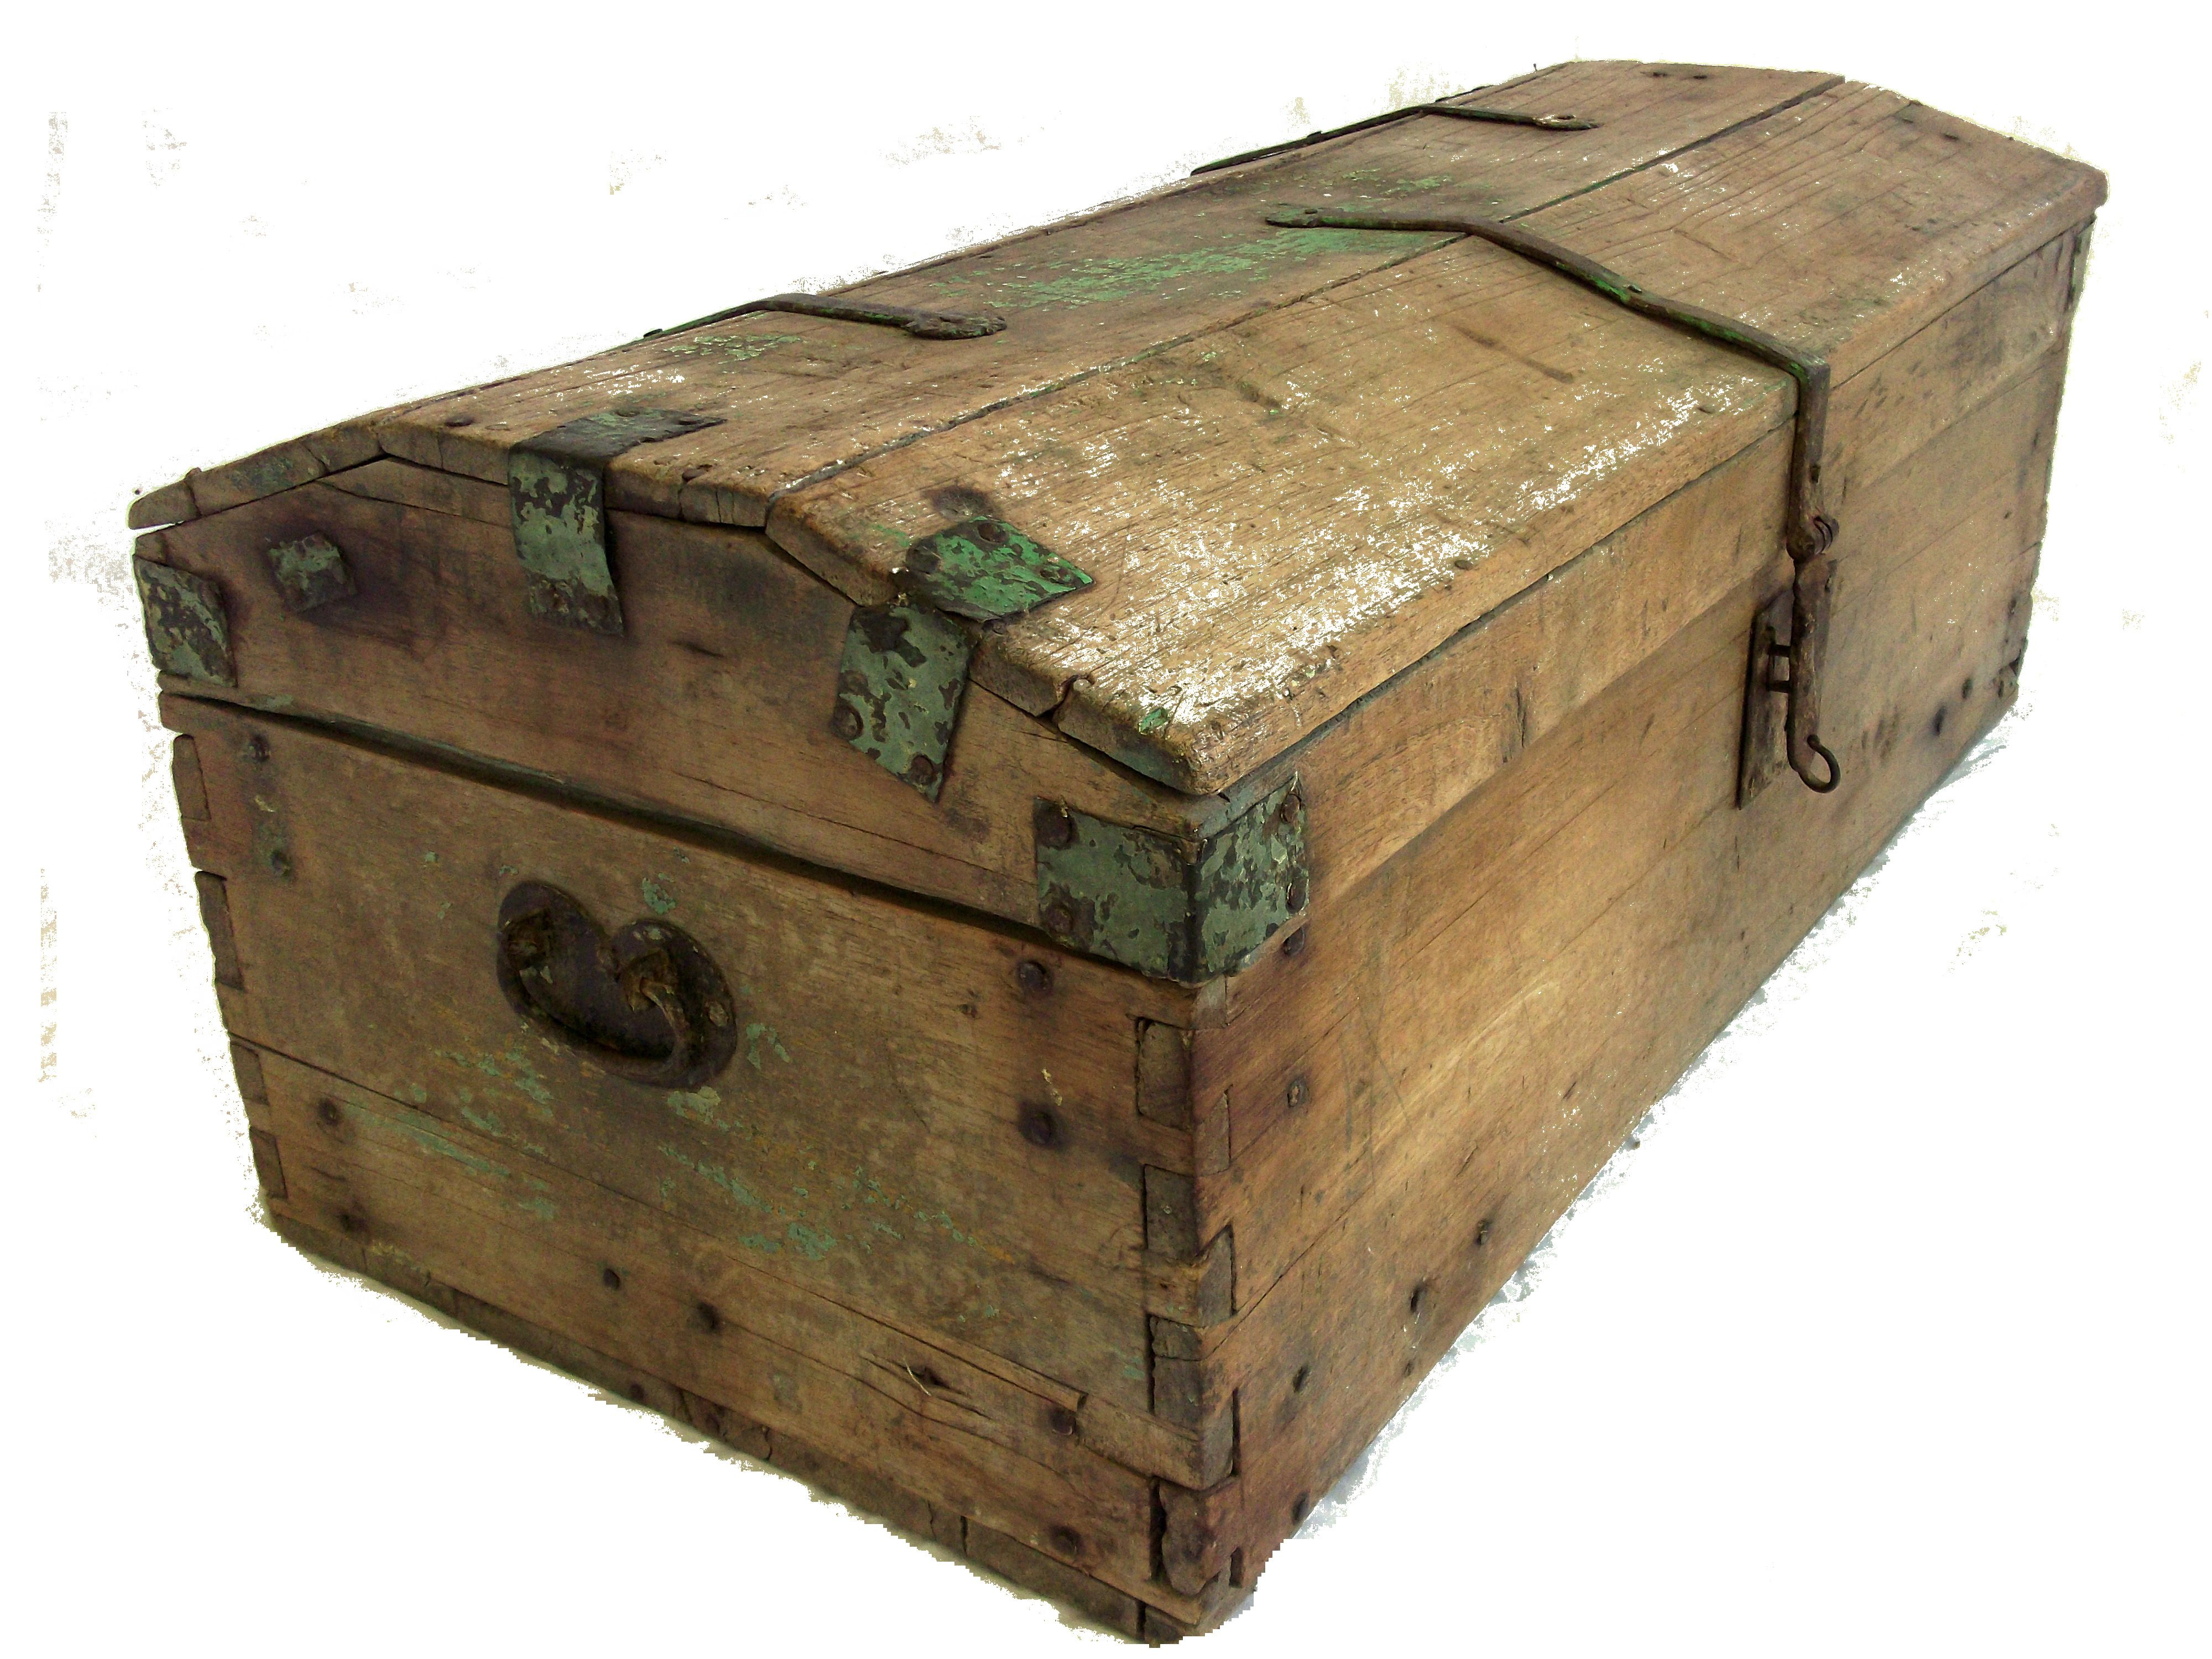 Late 1700 S Antique Wooden Coach Trunk Old Wooden Boxes Antique Trunk Antiques